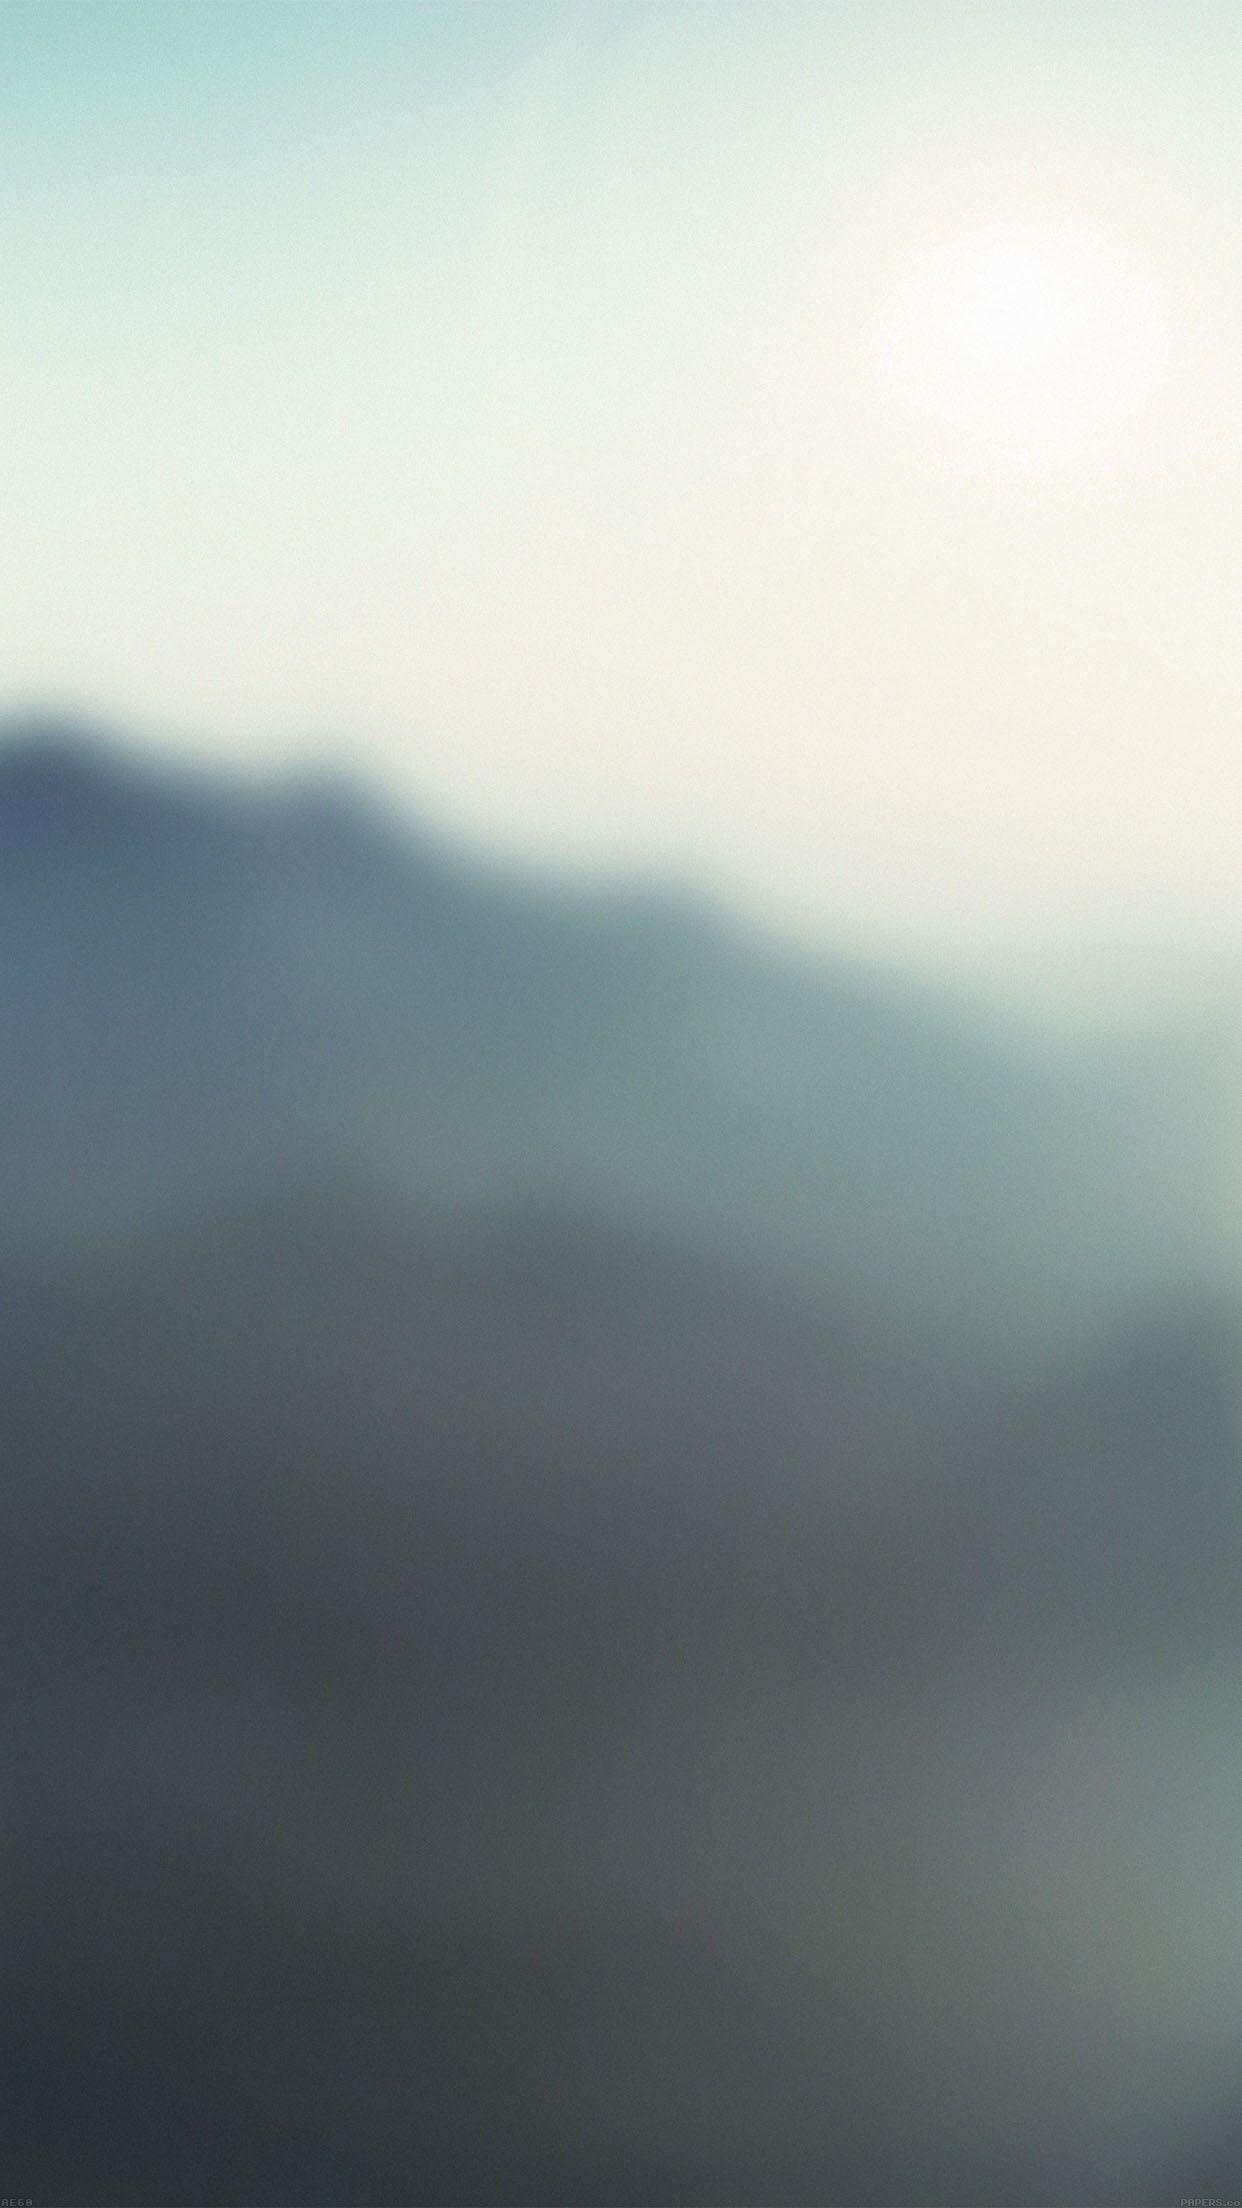 Amazing Wallpaper Mountain Blurry - d9be0319a4ebf3b0fc28f3304d28dd6b  Trends_866551.jpg